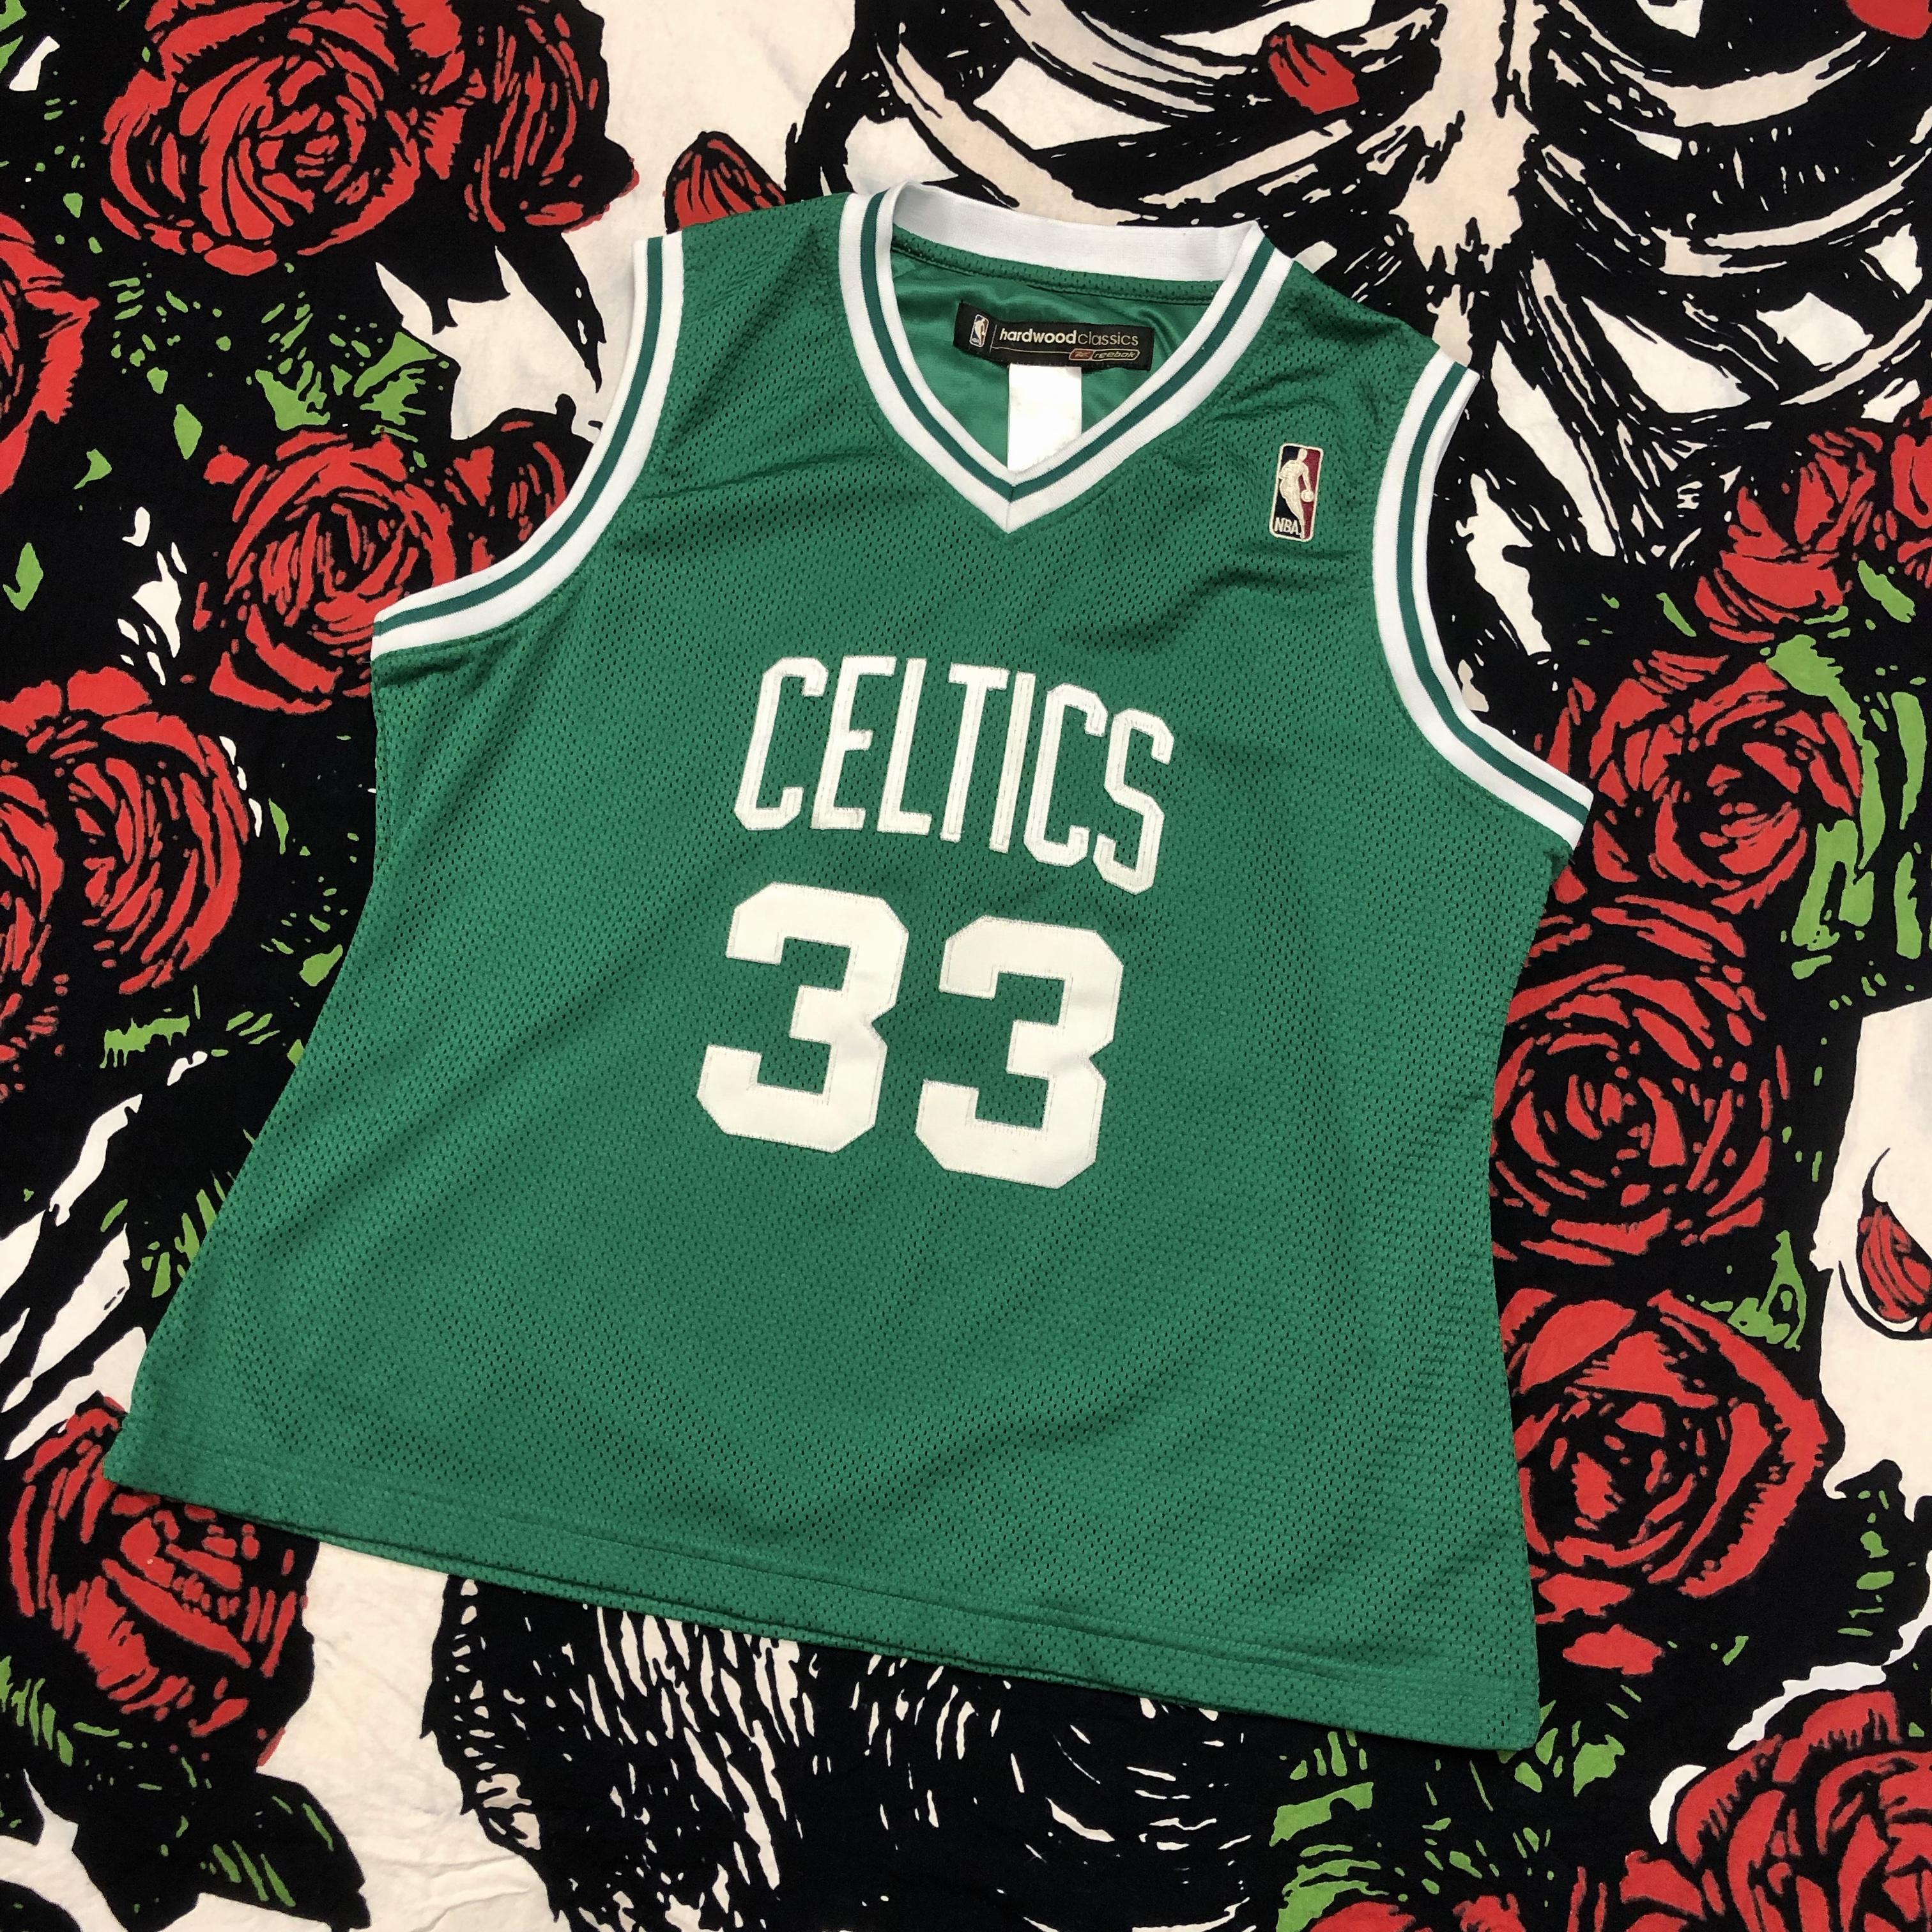 92e922db9bd Vintage × Reebok × Nba. 2000s Larry Bird Boston Celtics Basketball Hardwood  Classics Embroidered Jersey VTG